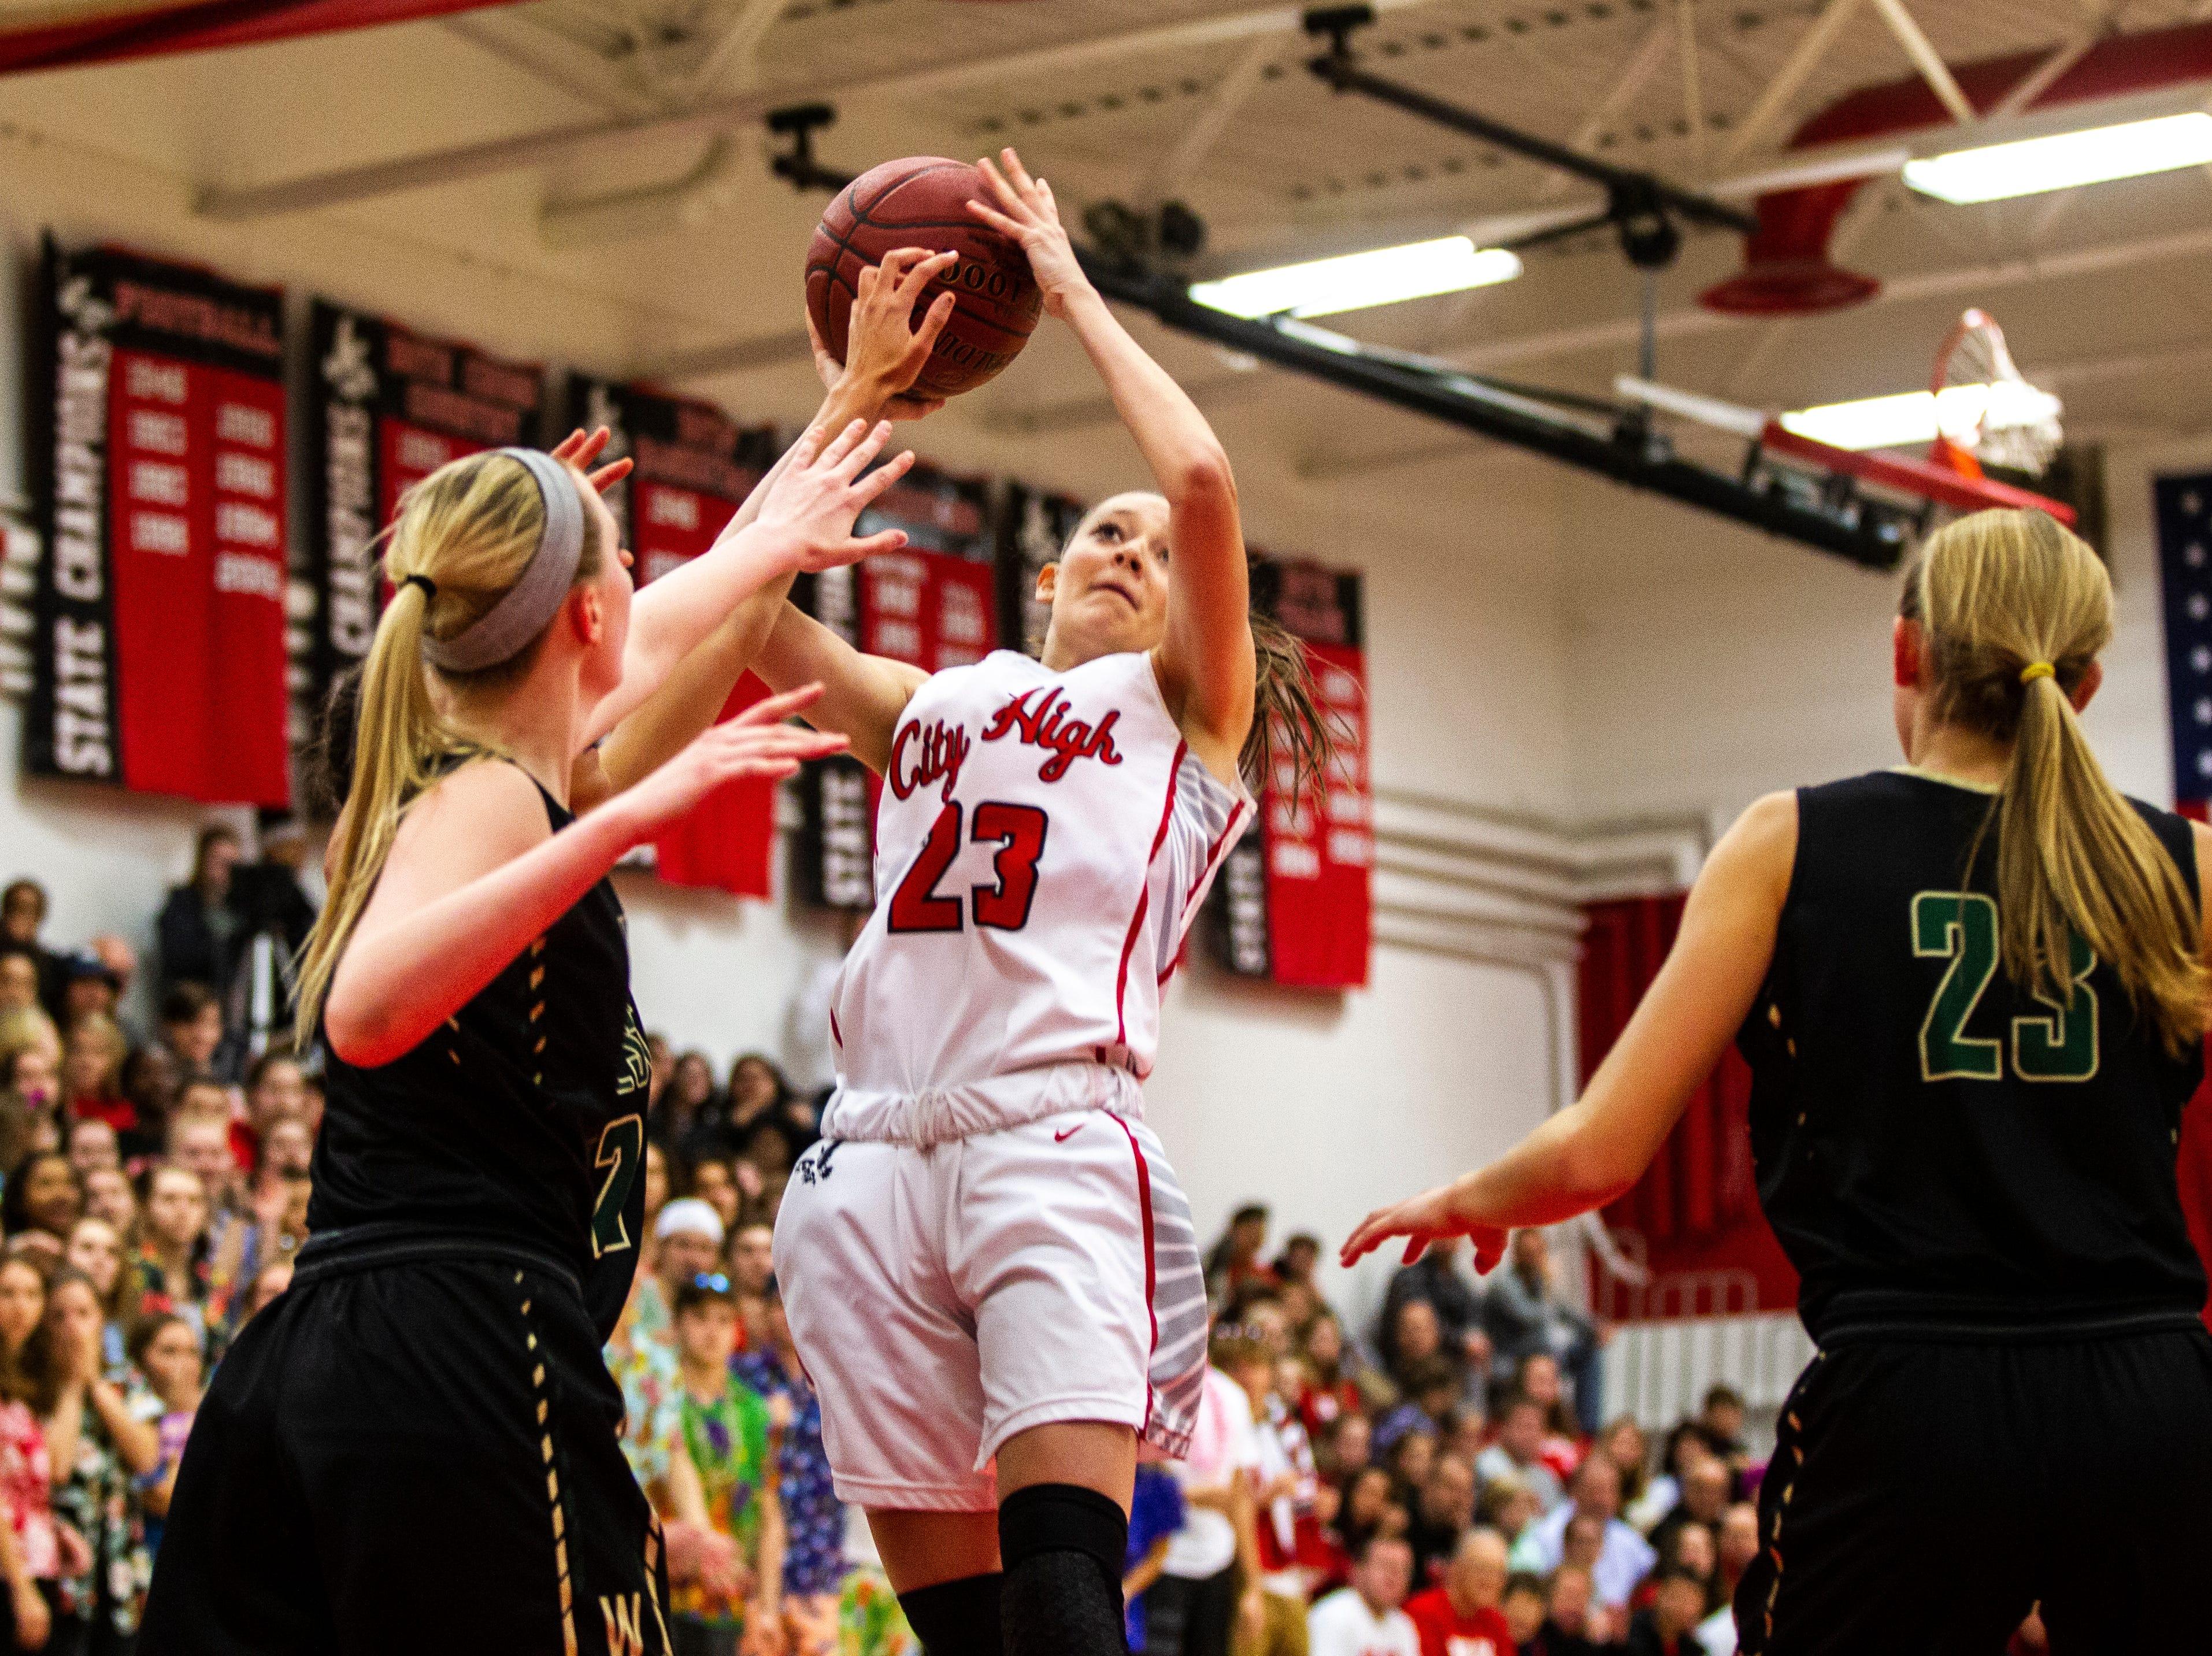 Iowa City High's Aubrey Joens (23) shoots a basket during a Class 5A girls basketball game on Friday, Dec. 7, 2018, at City High School in Iowa City.